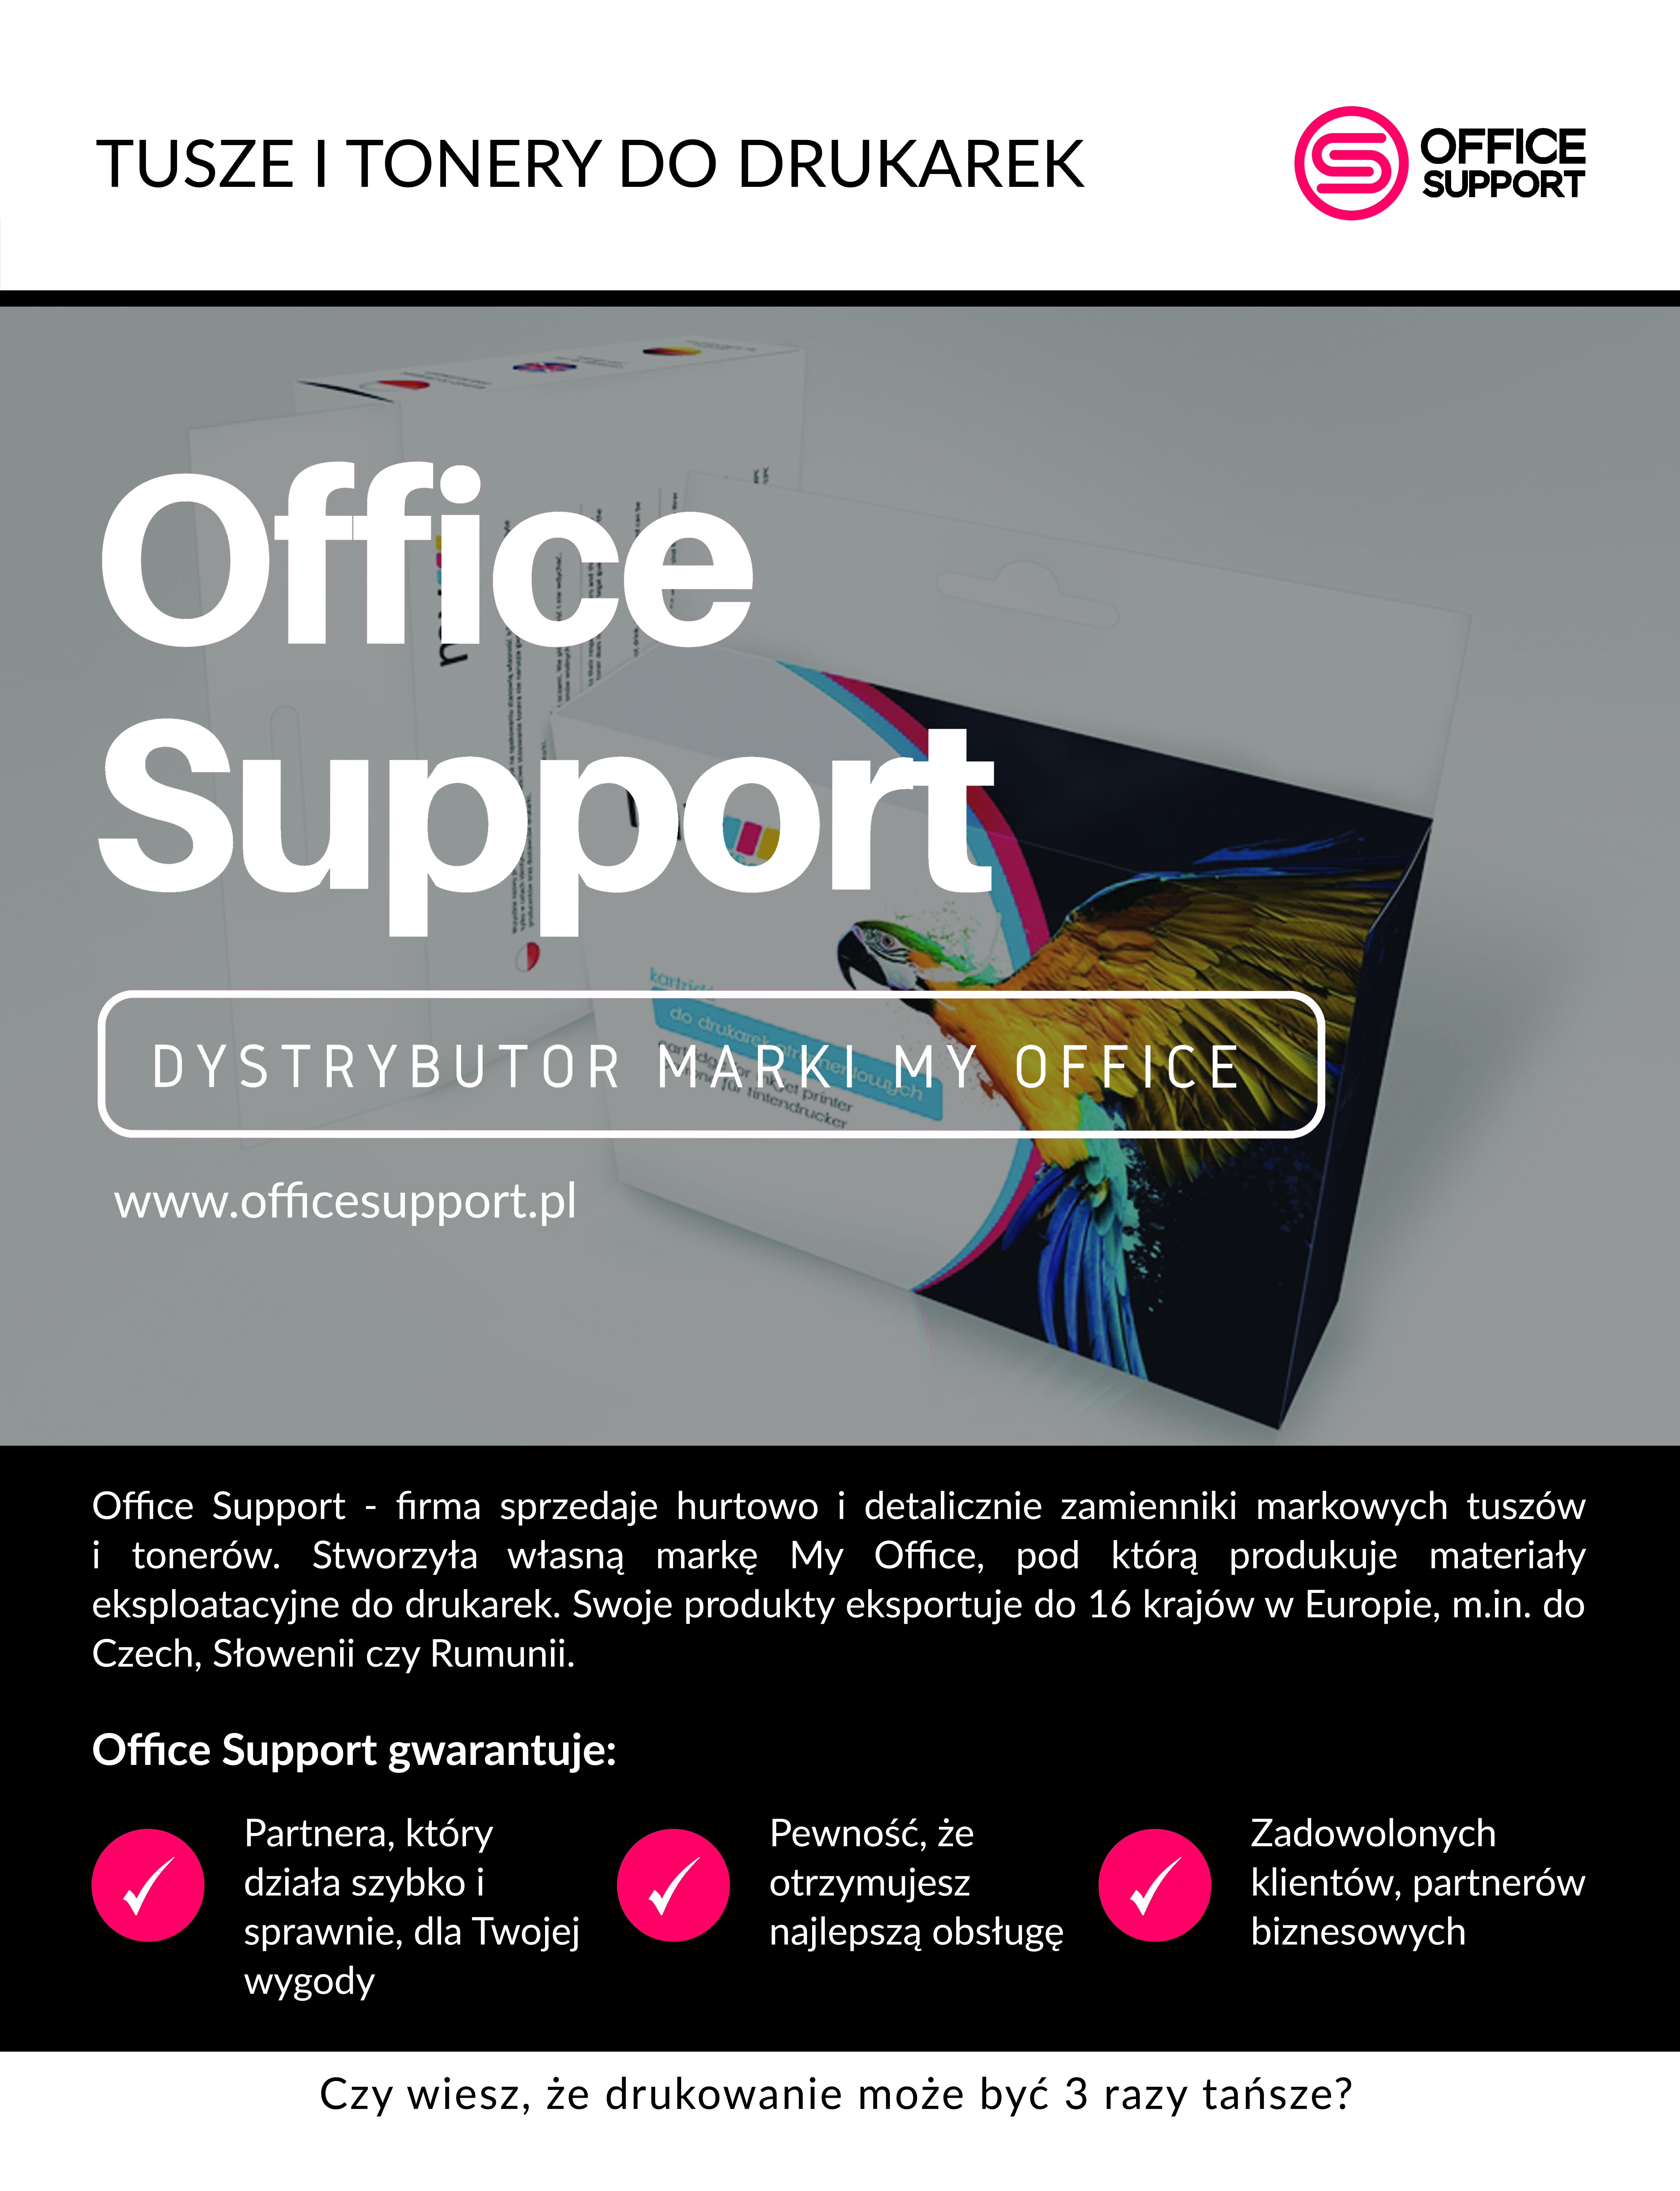 Dystrybutor marki My Office